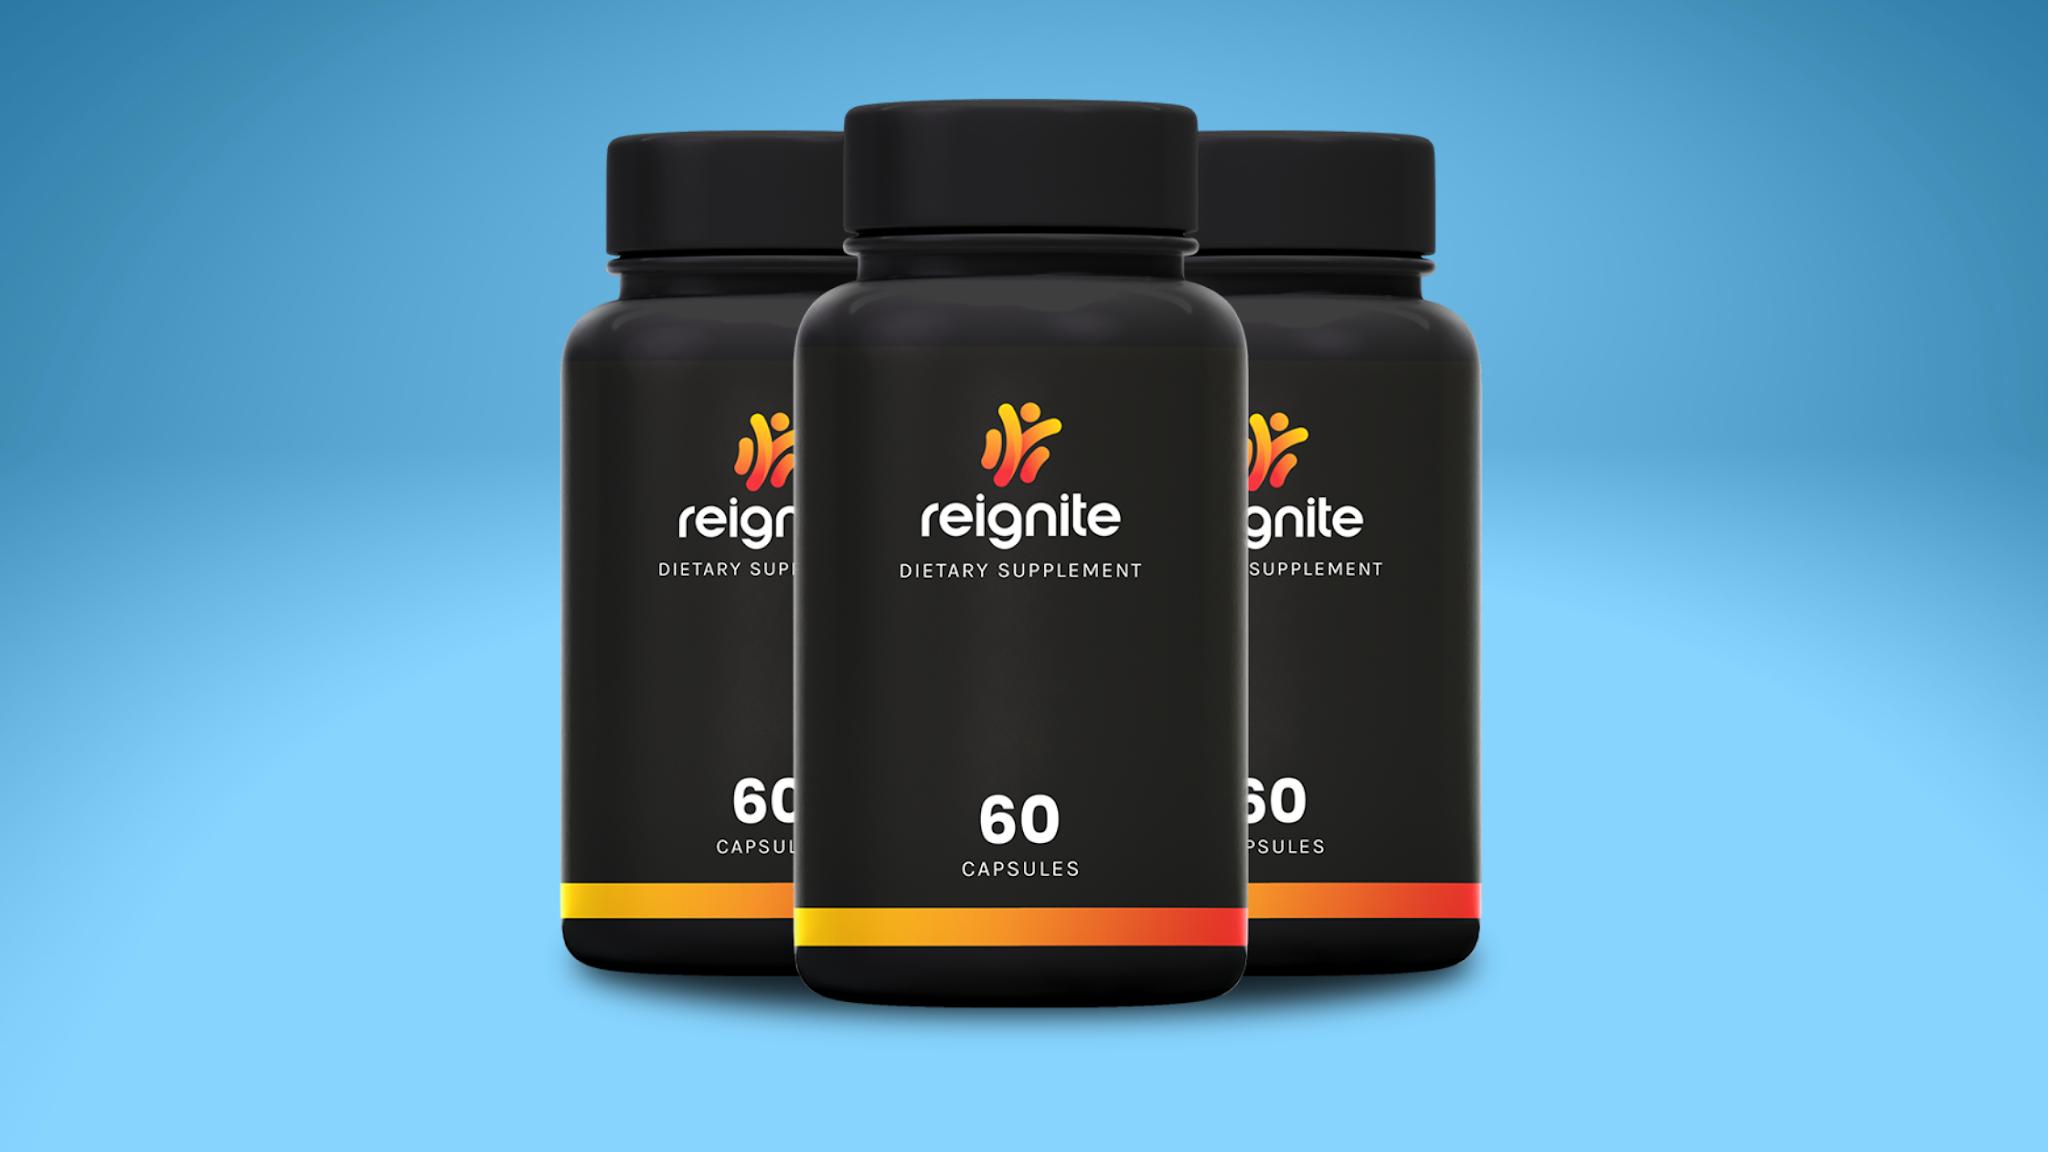 Reignite Reviews: Is Reignite Worth the Money? (Scam or Legit?)